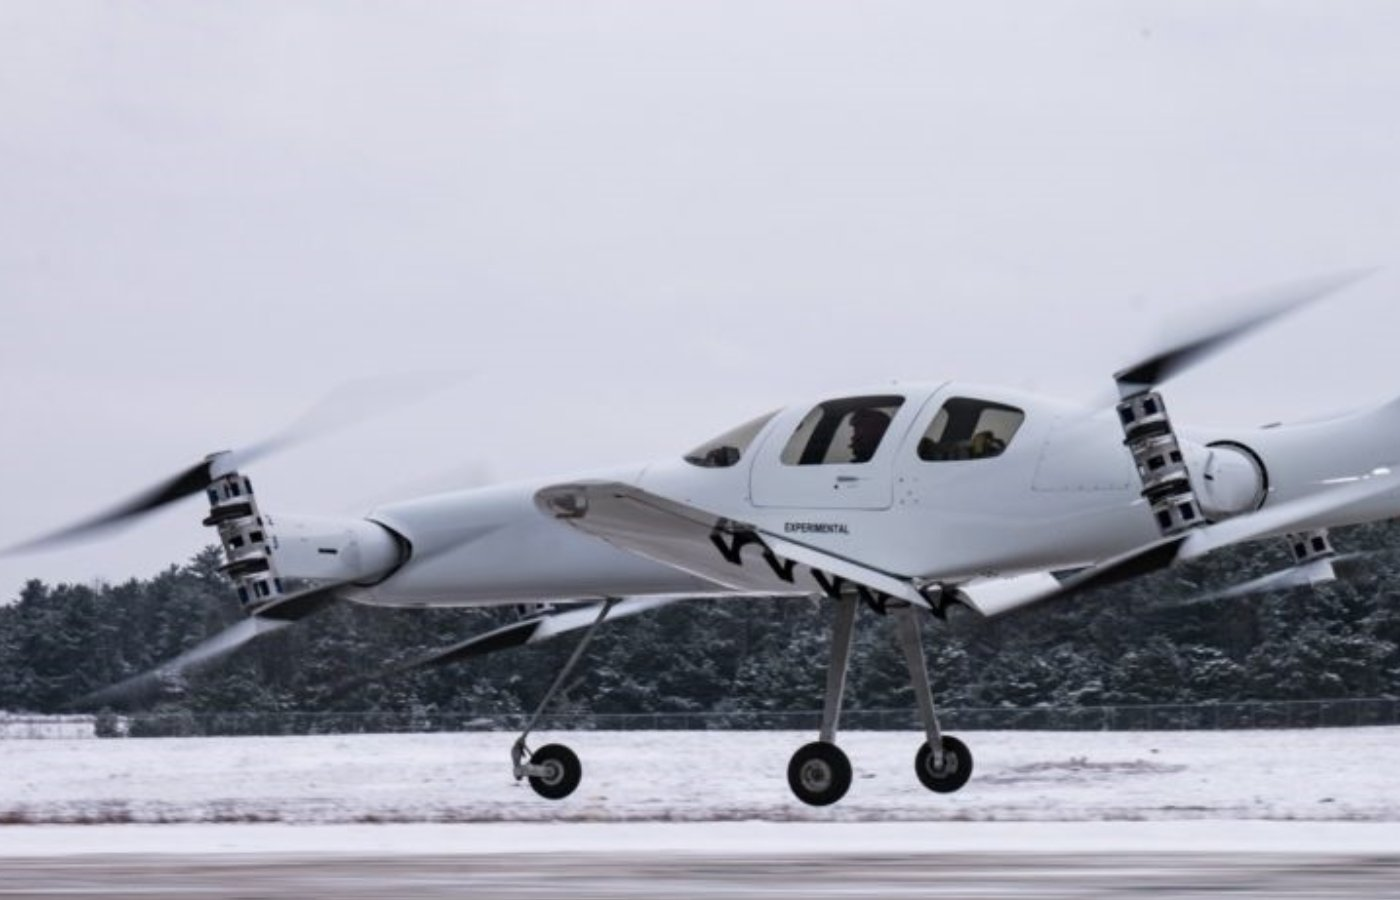 Behind the controls of an eVTOL aircraft: A test pilot's